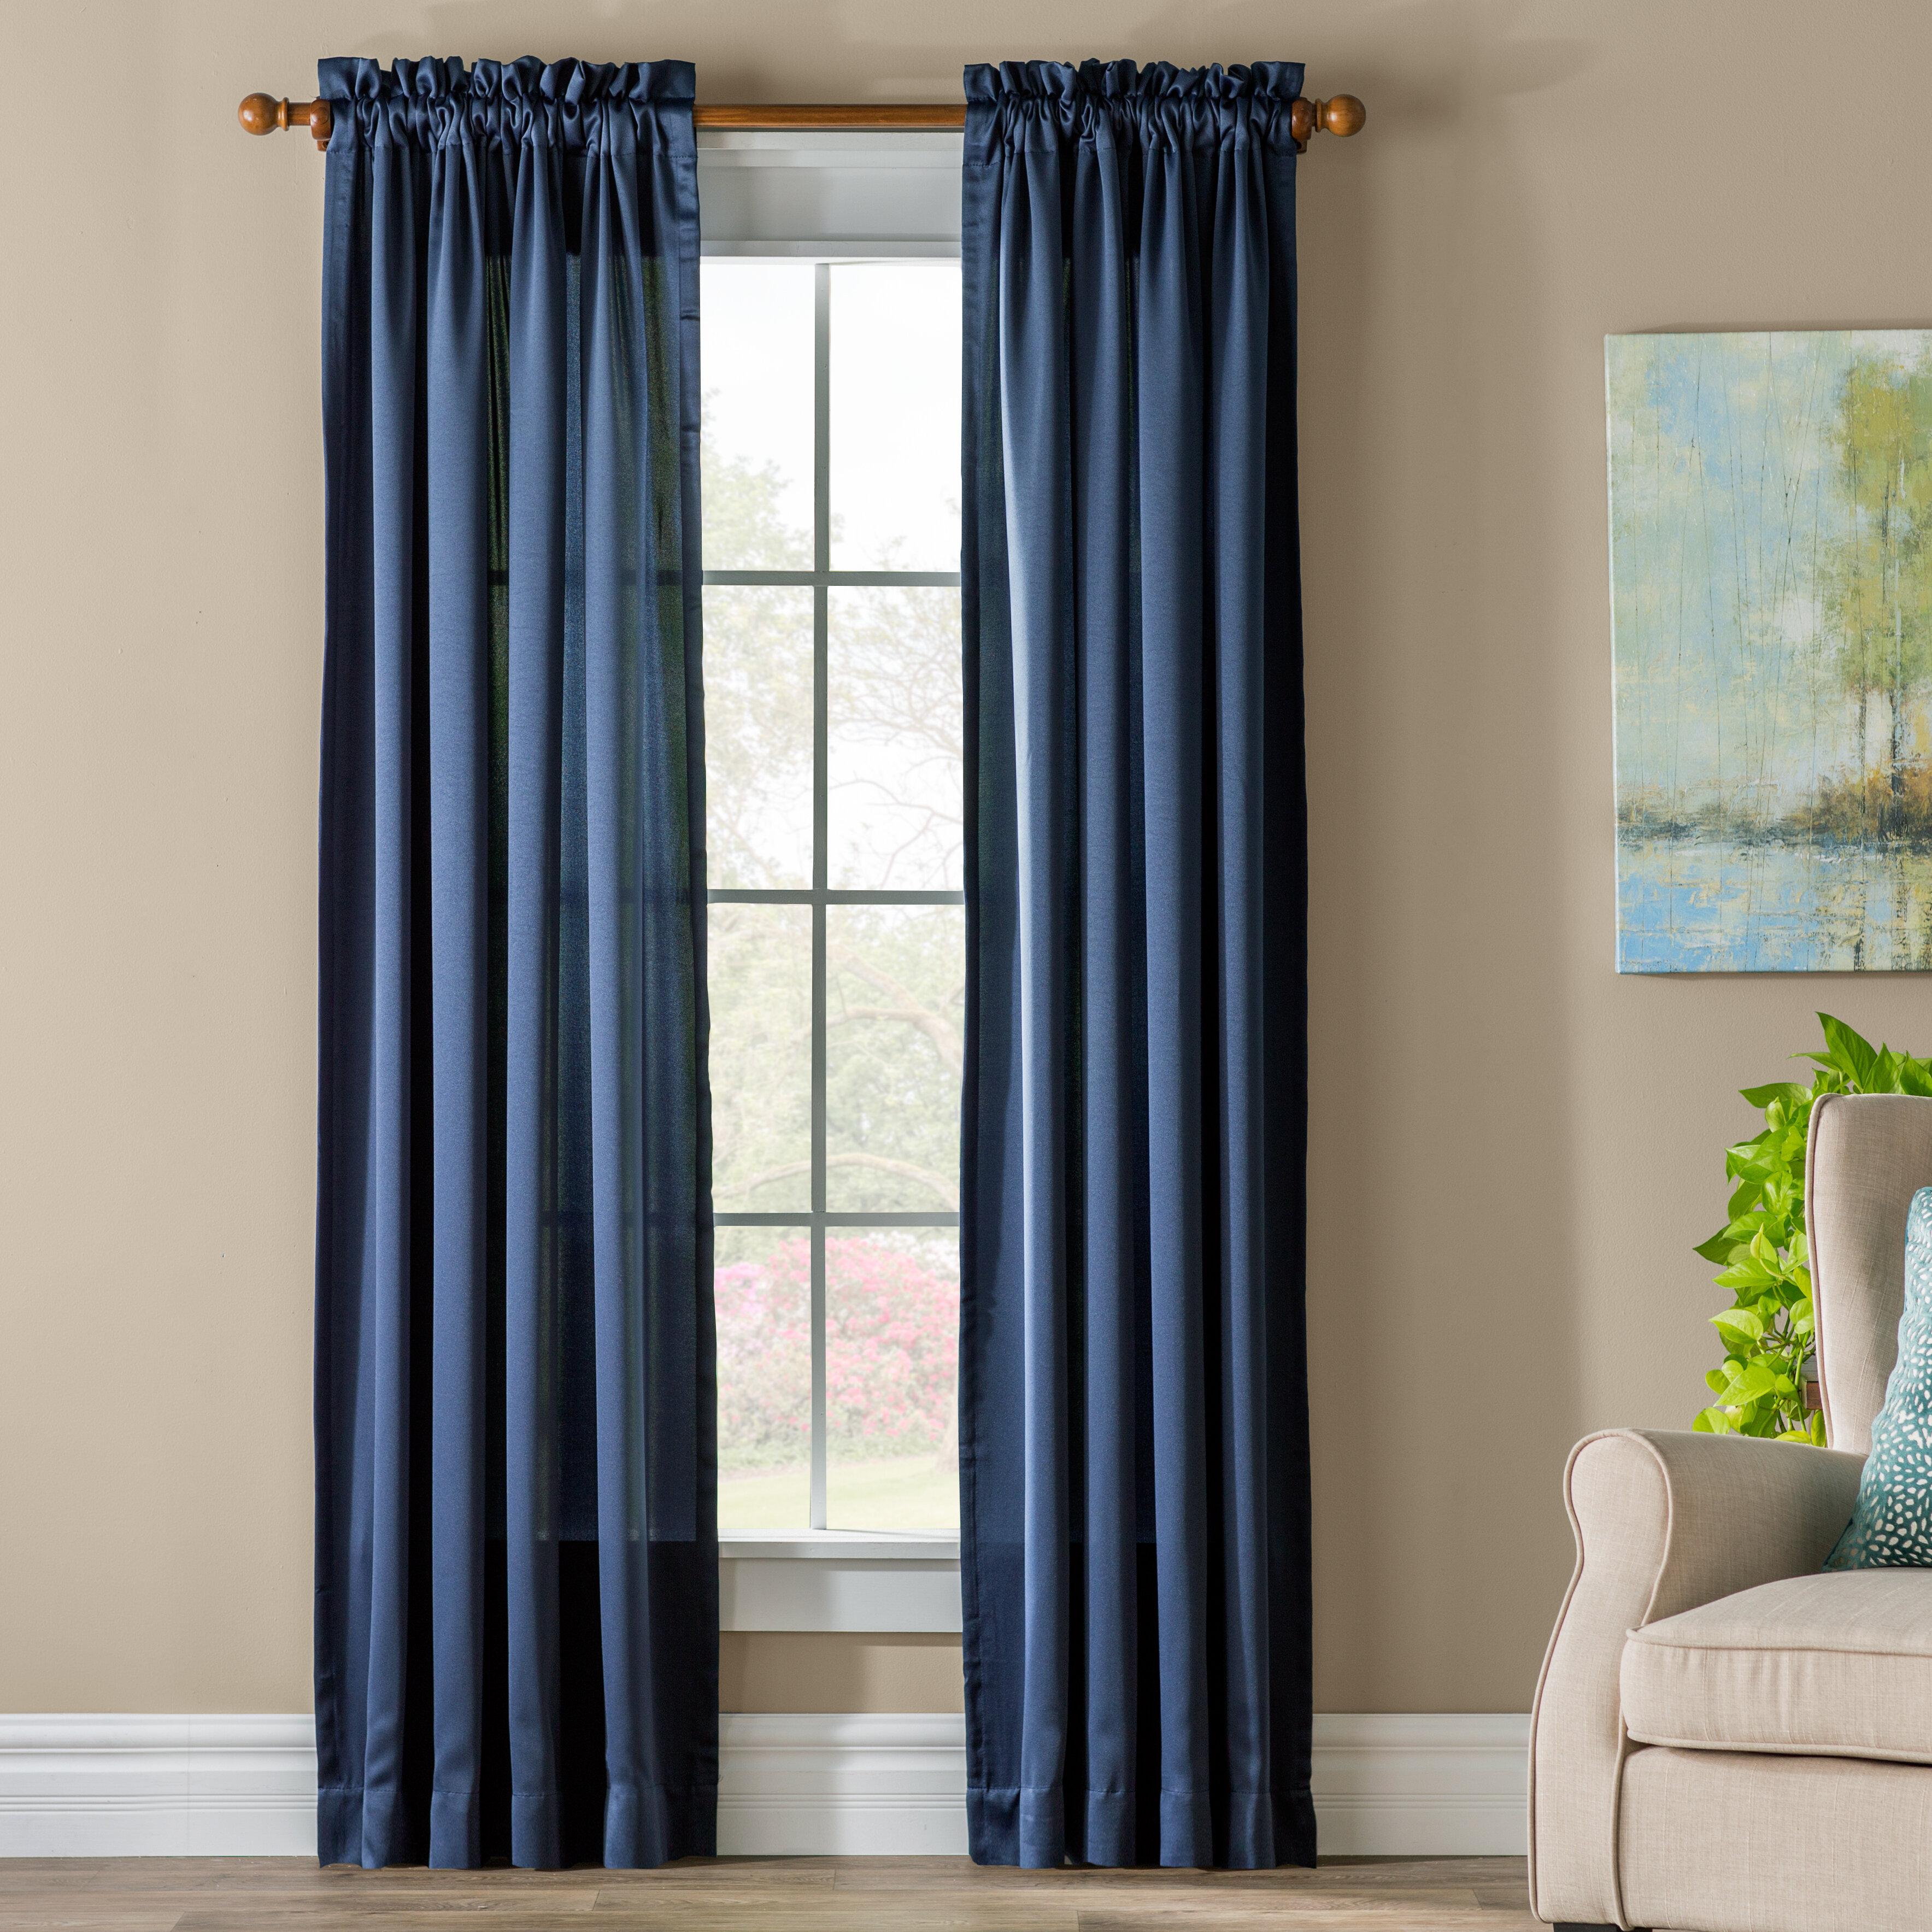 Wayfair Blue Green Curtains Drapes You Ll Love In 2021